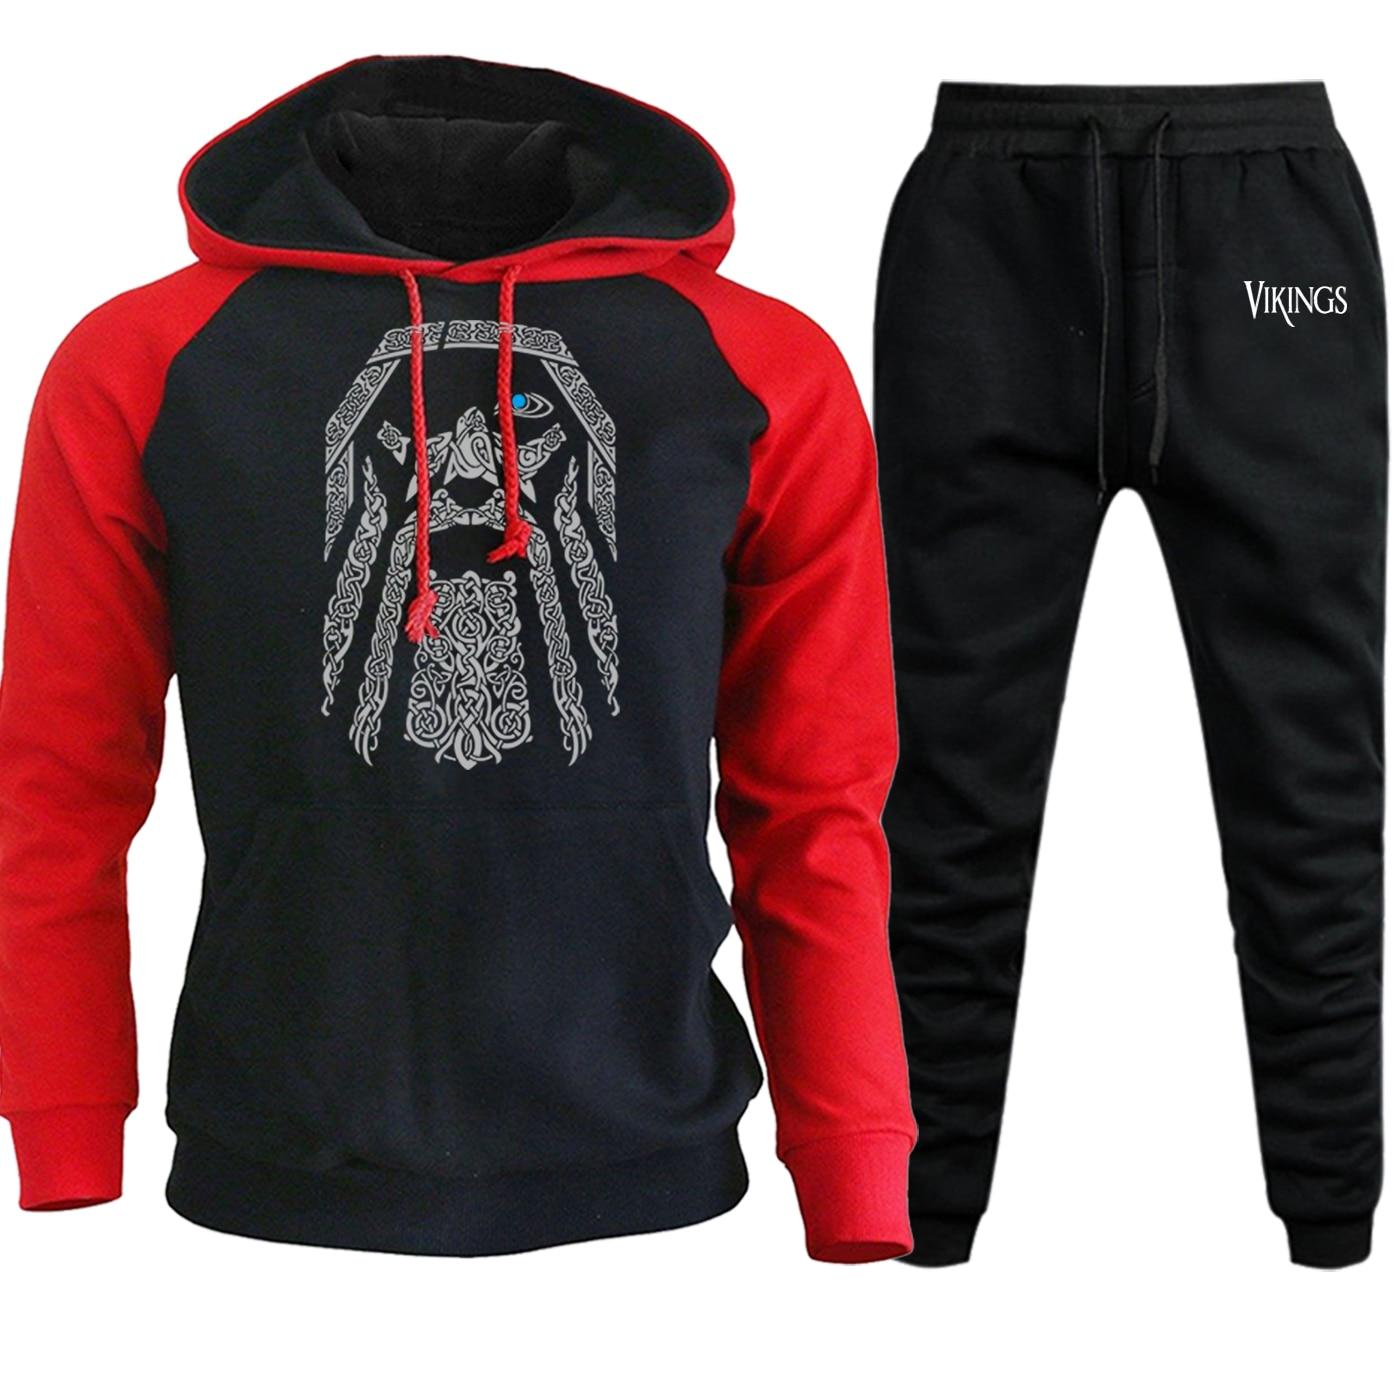 Autumn New Hooded Mens Raglan Sweatshirts Odin Vikings Casual Pullover Hip Hop Streetwear Male Suit Hoodie+Pants 2 Piece Set